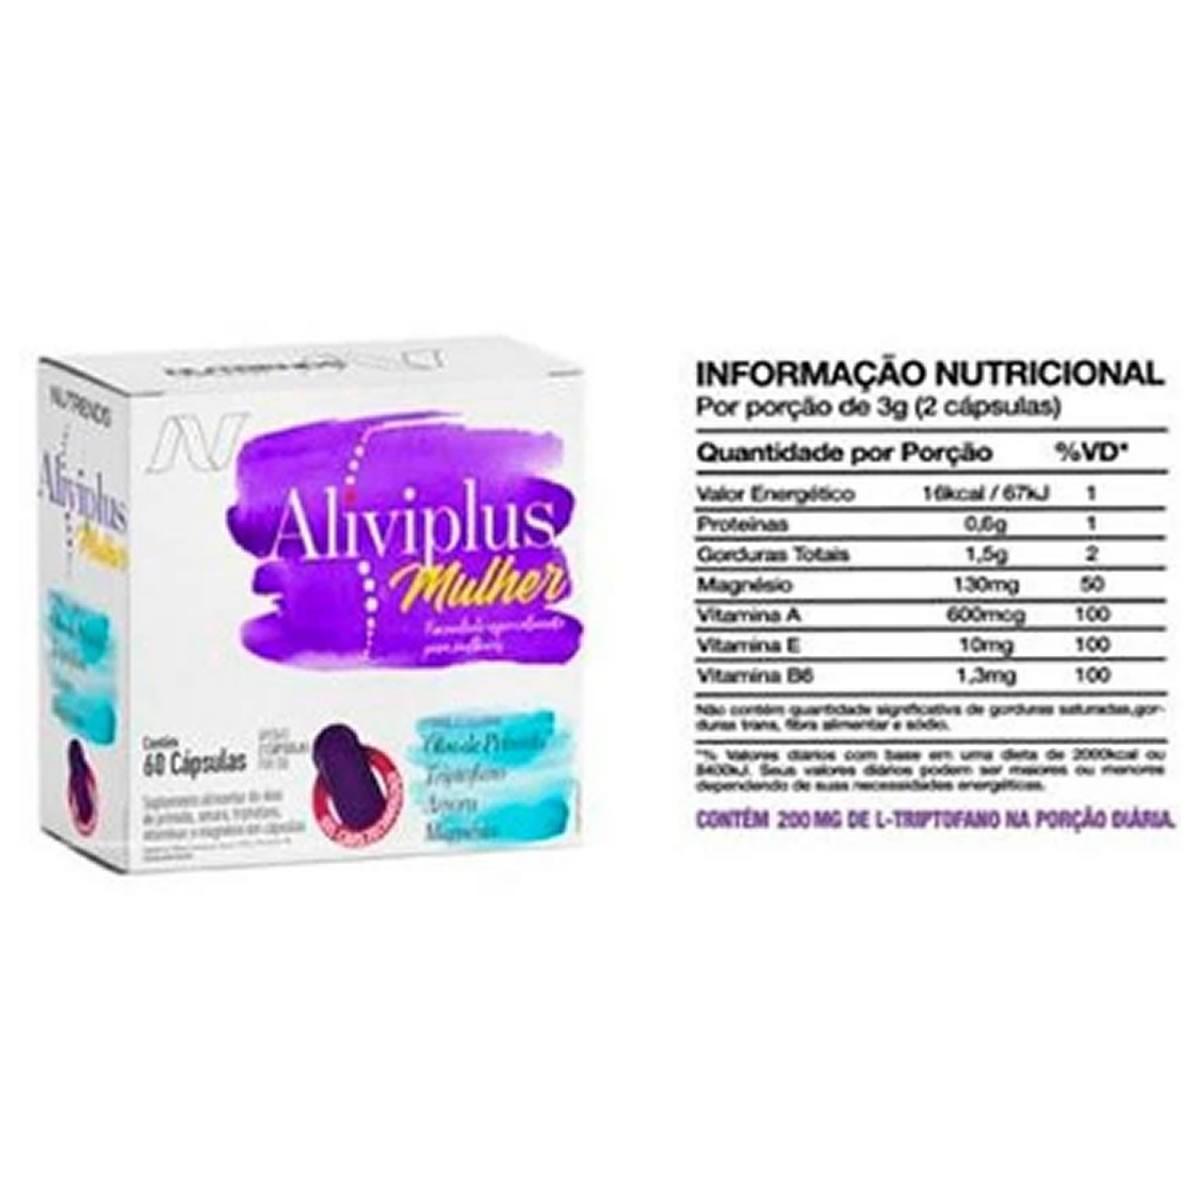 Aliviplus Mulher - 60 cápsulas - Nutrends